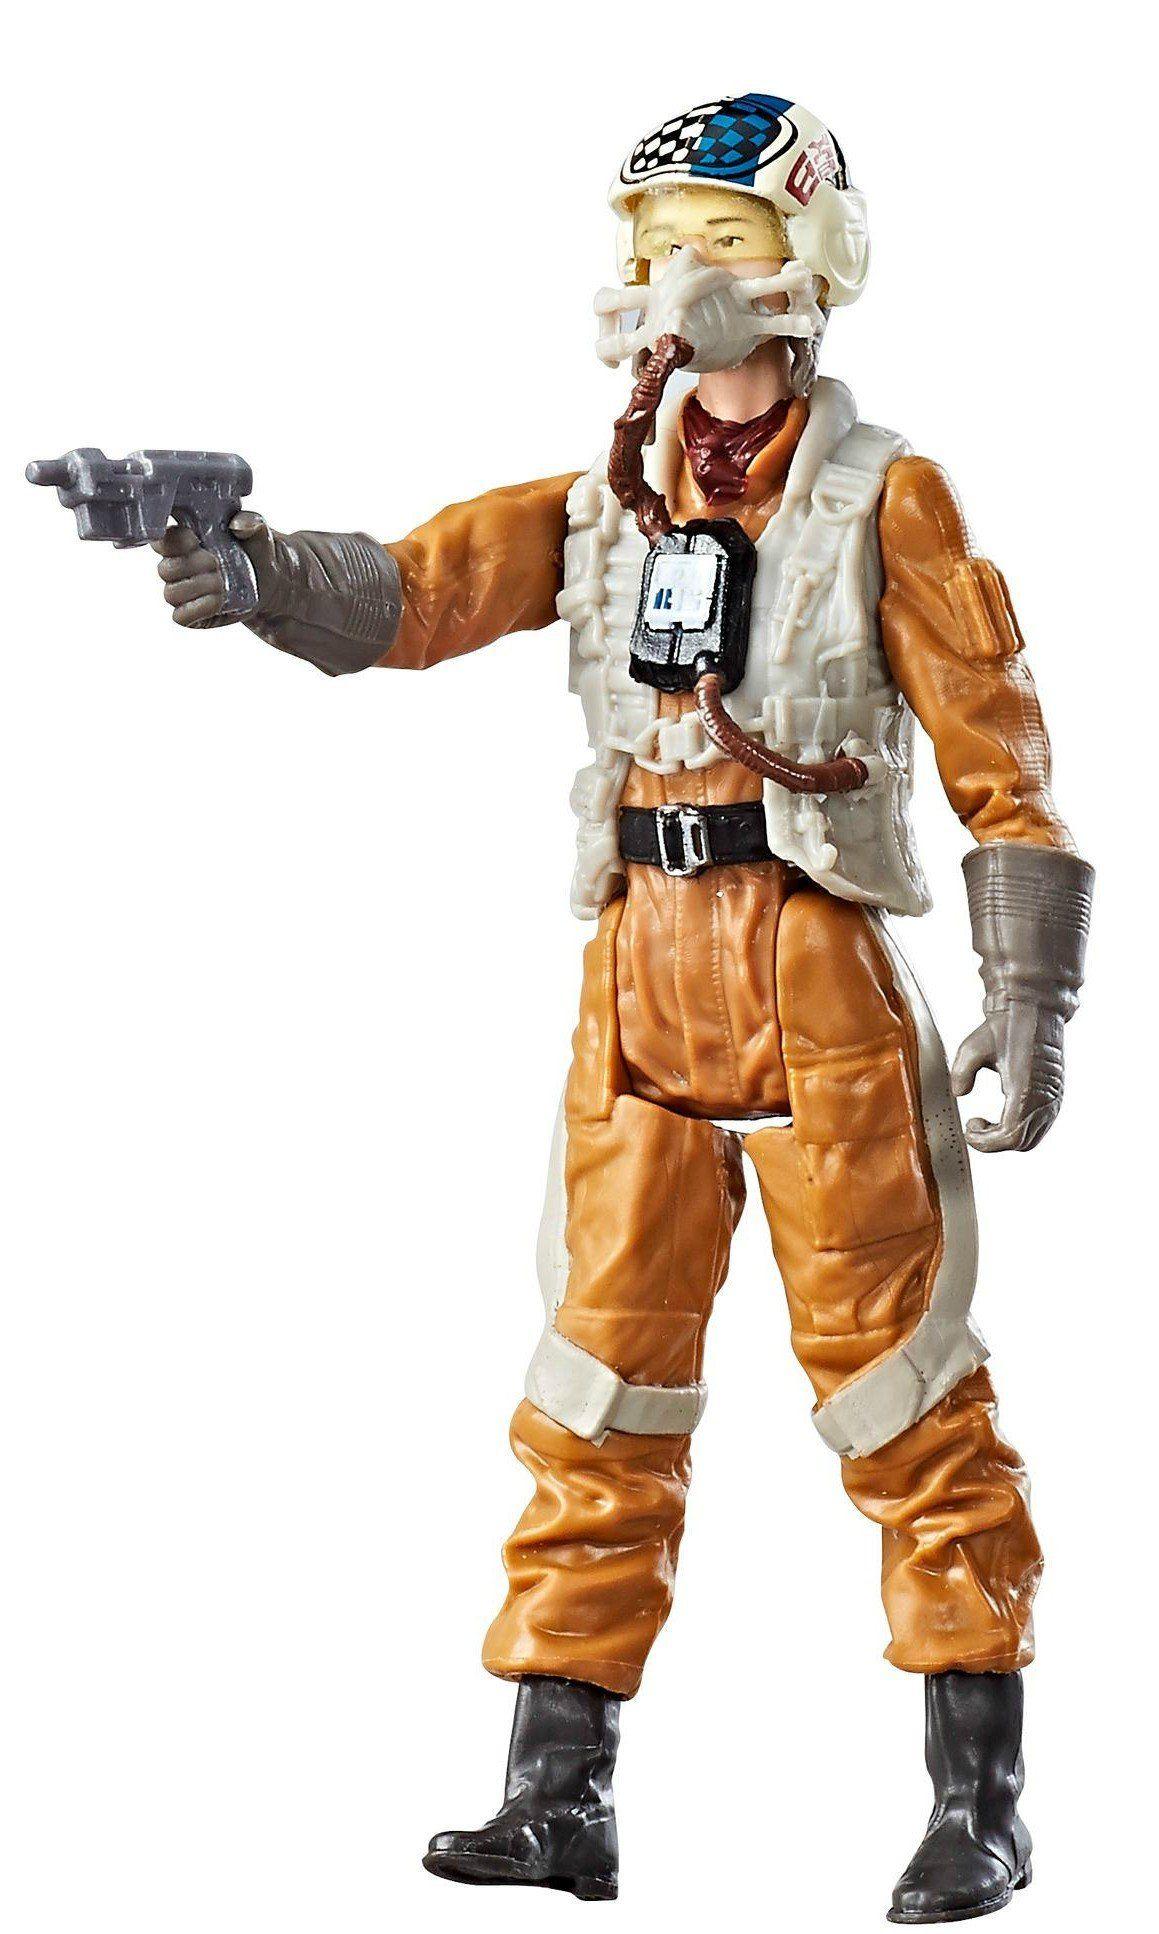 Boneco Paige (Force Link): Star Wars The Last Jedi (Os Últimos Jedi) - Hasbro